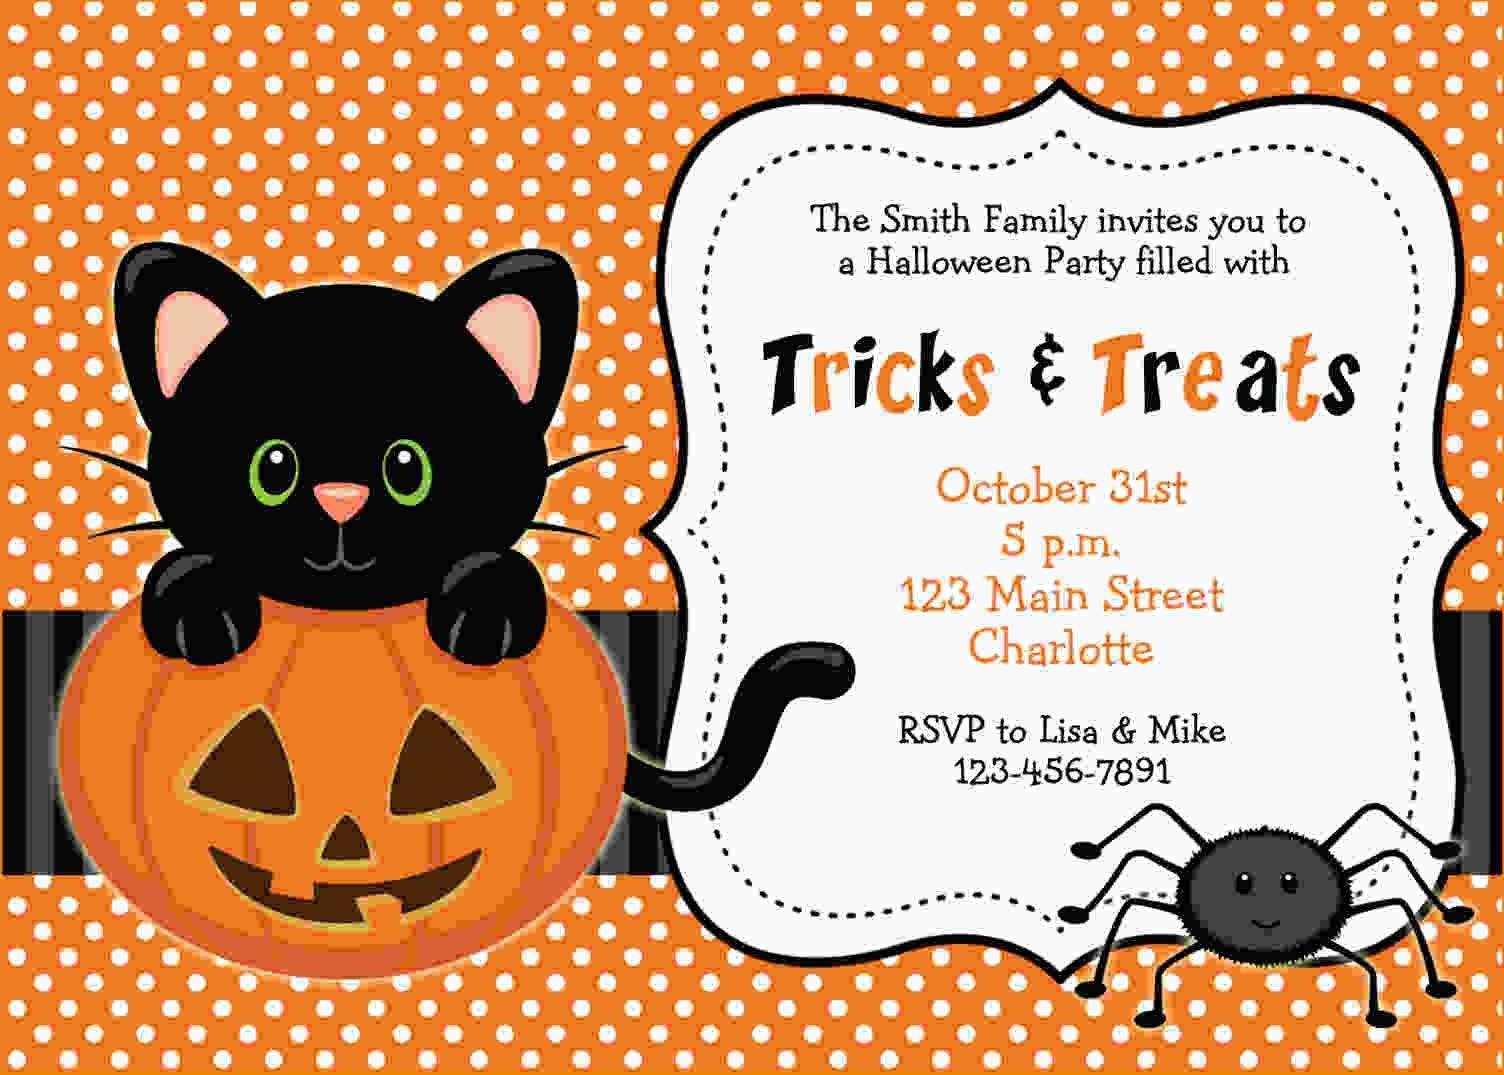 Free Printable Halloween Invitations | Free Printable Birthday - Halloween Invitations Free Printable Black And White